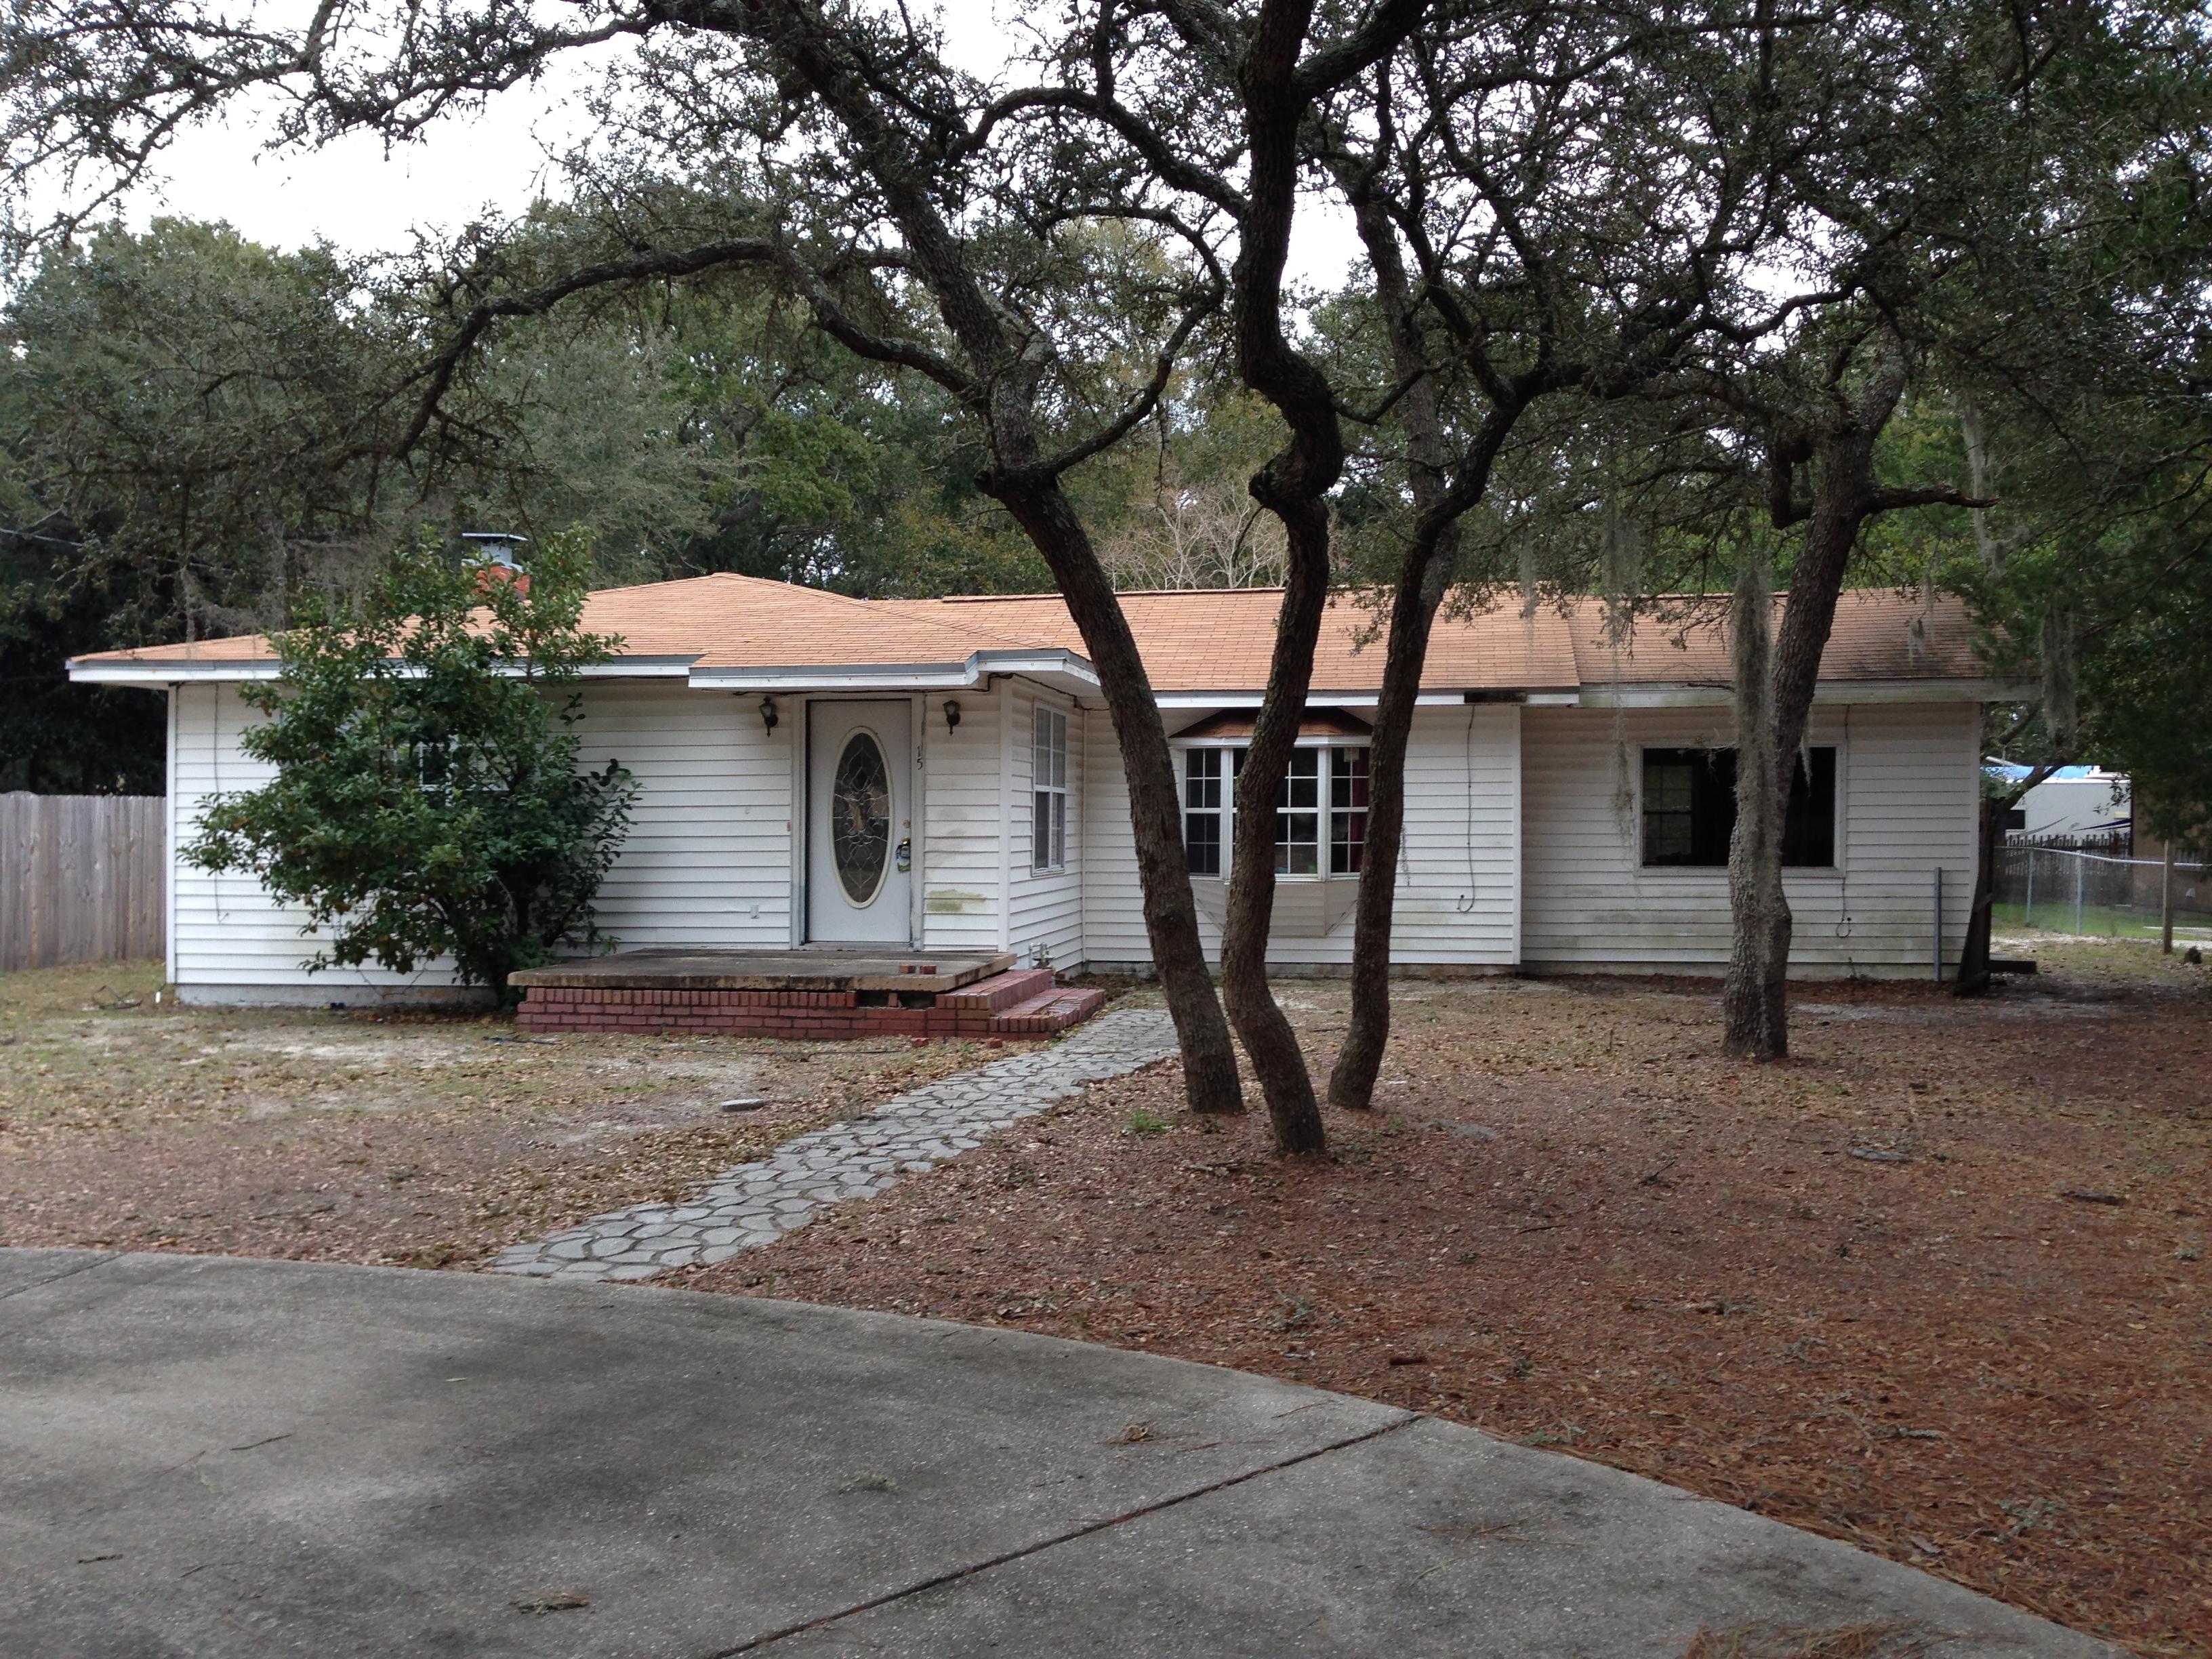 Commercial Rental Property Crestview Florida